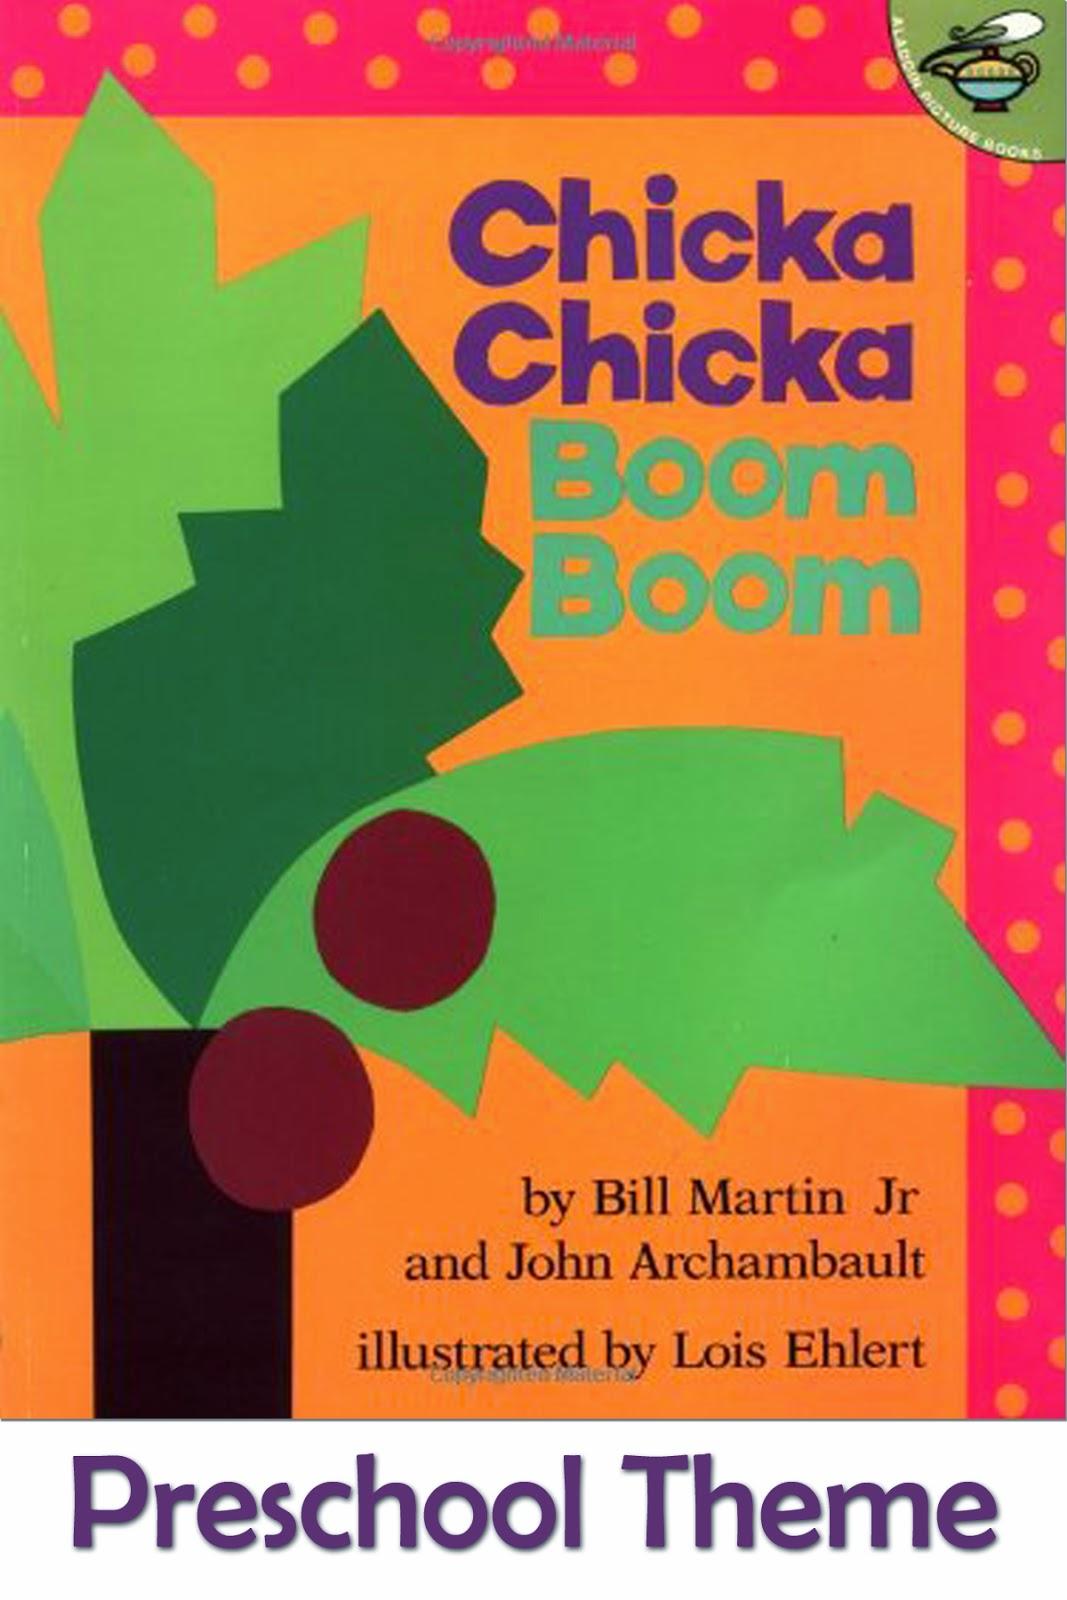 Mommy S Little Helper Chicka Chicka Boom Boom Preschool Theme